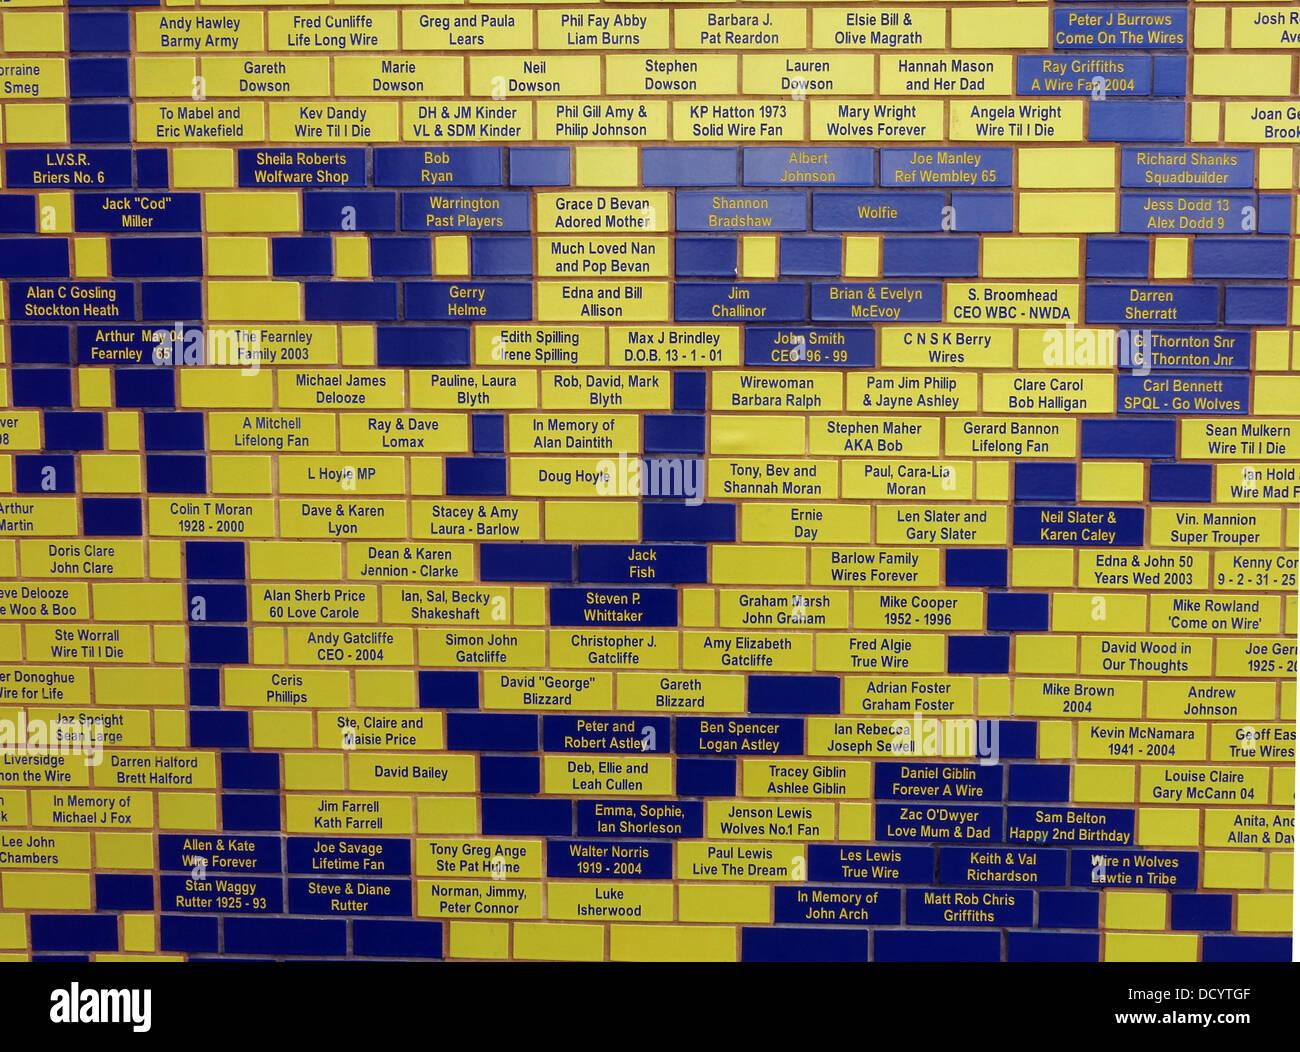 Warrington,Rugby,League,Wolve,Wolfs,history,sporting,heritage,historic,world,cup,2013,Samoa,New,Zealand,match,game,venue,for,brick,professional,football,footballer,famous,1940,1950,gotonysmith,Jones,Halliwell,Rugby,stadium,Winwick,Road,Warrington,WA2,7NE,United,Kingdom,WA27NE,Buy Pictures of,Buy Images Of